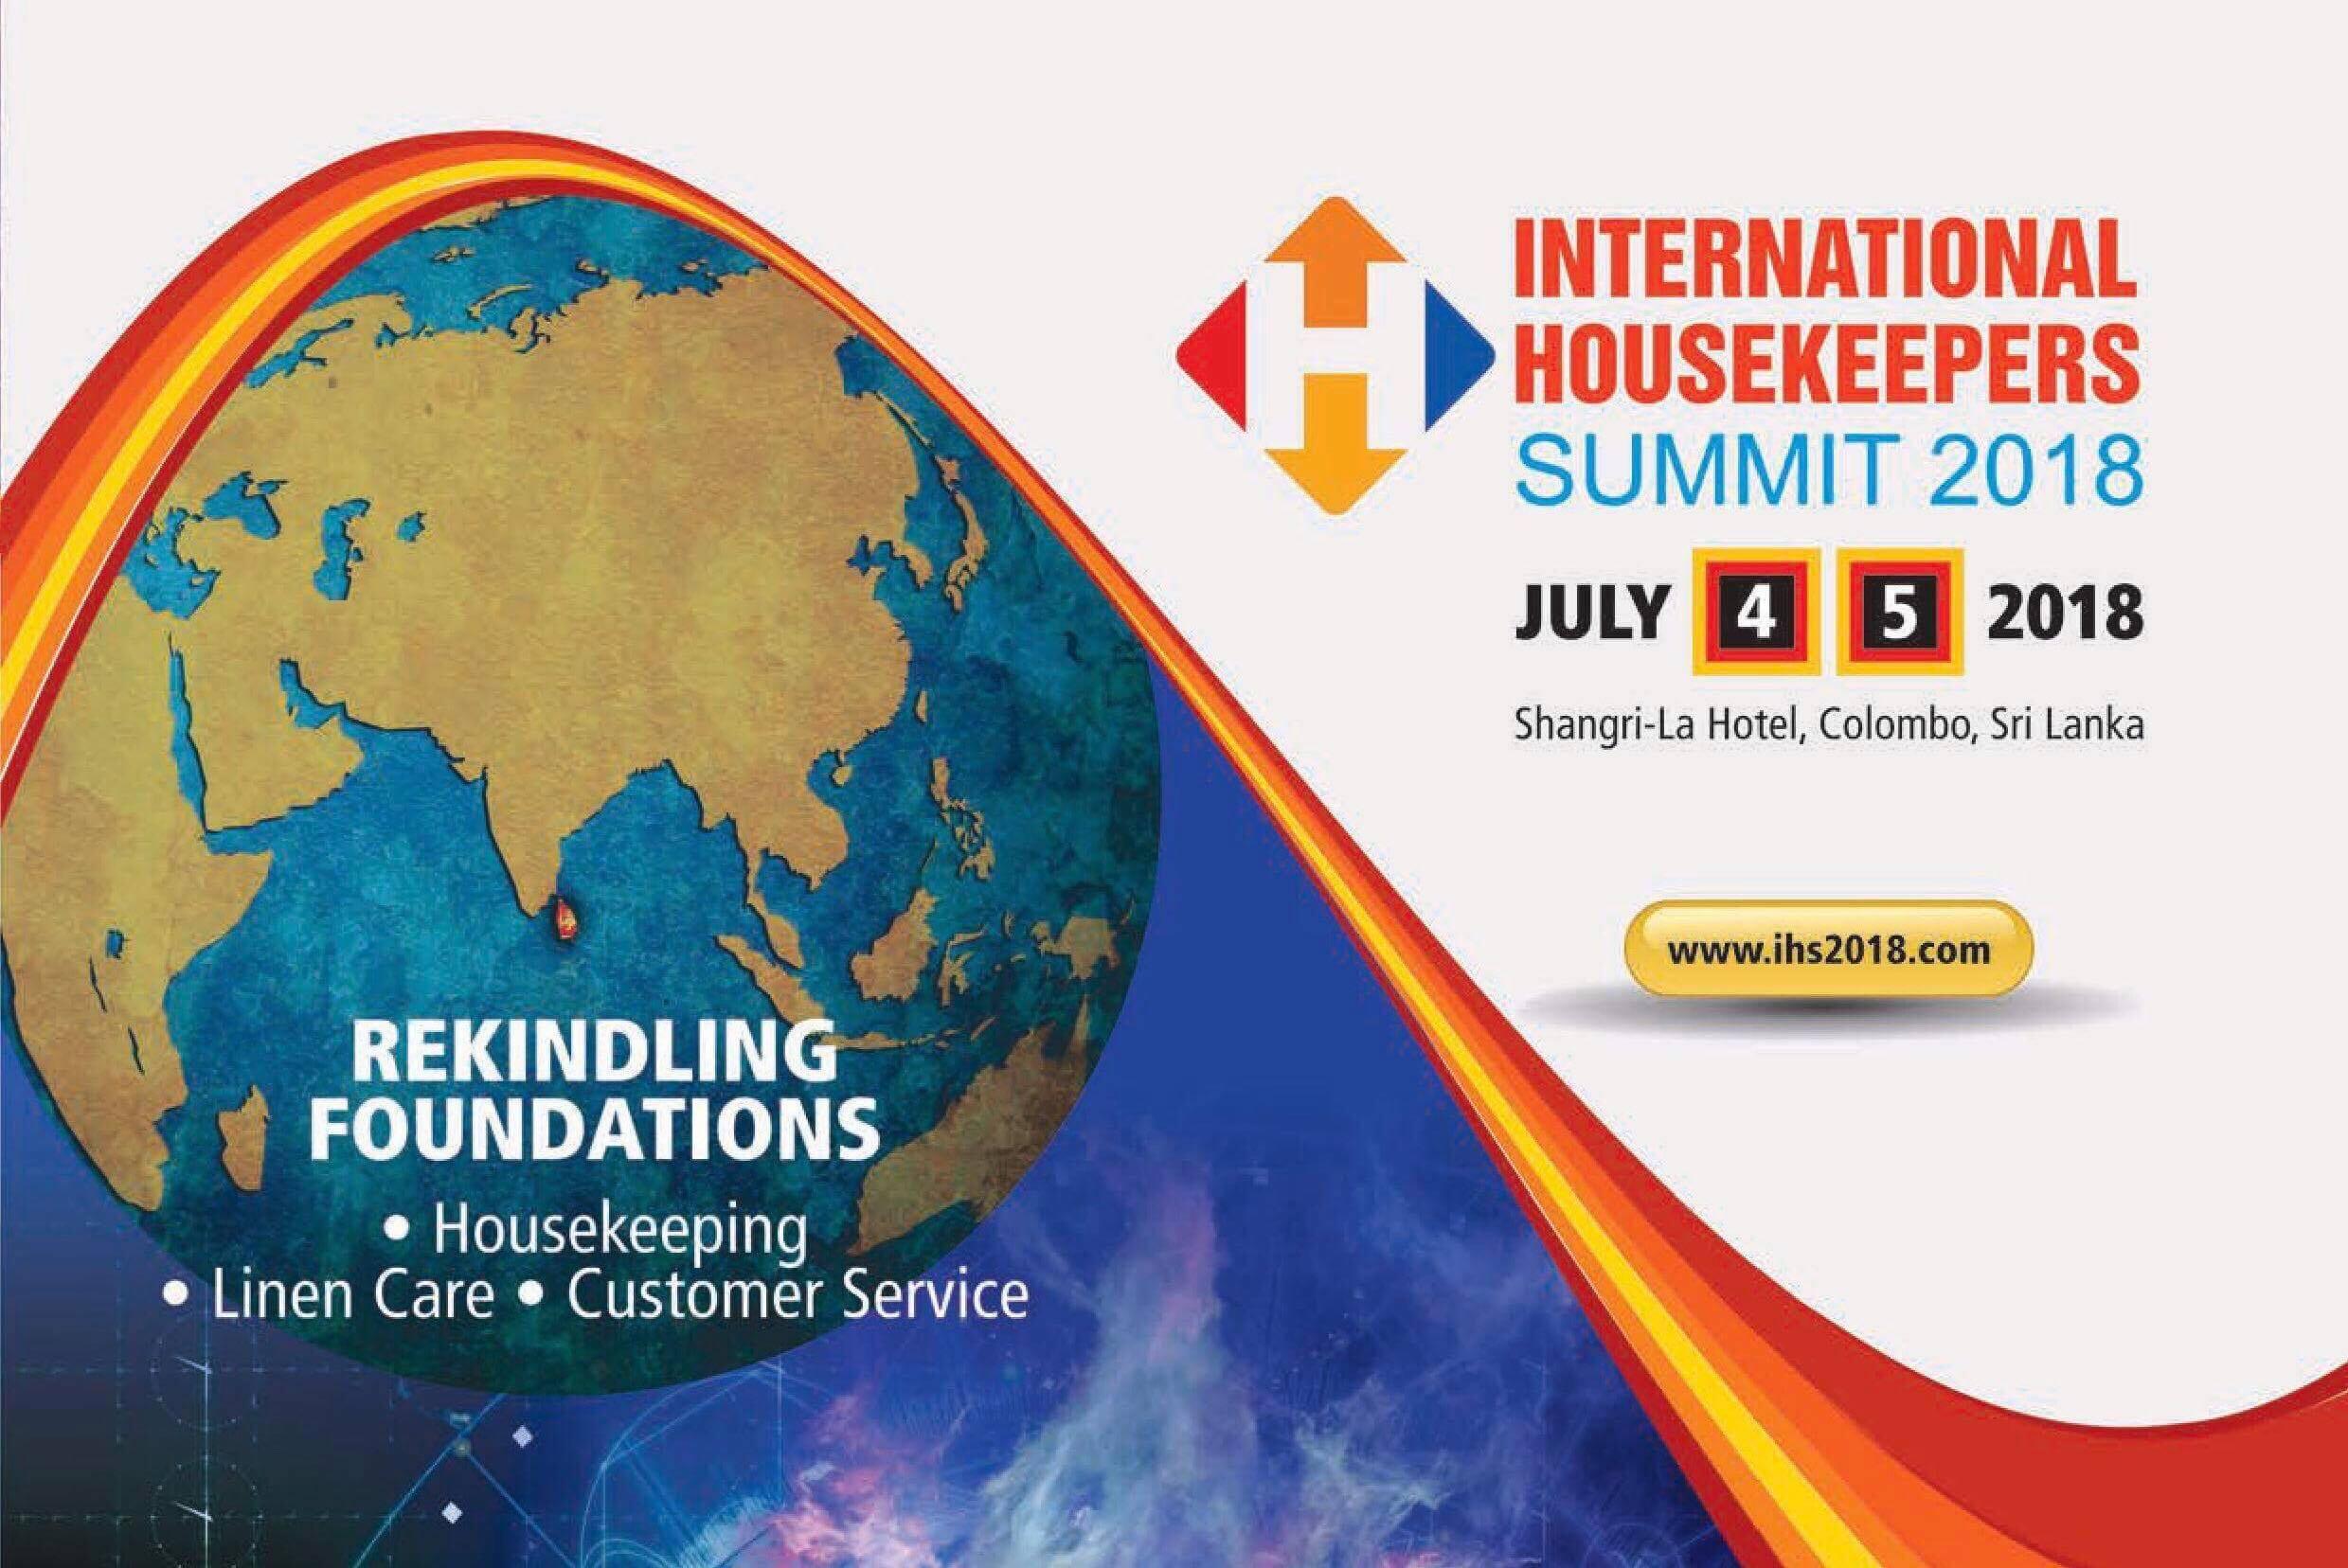 International Housekeepers' Summit 2018